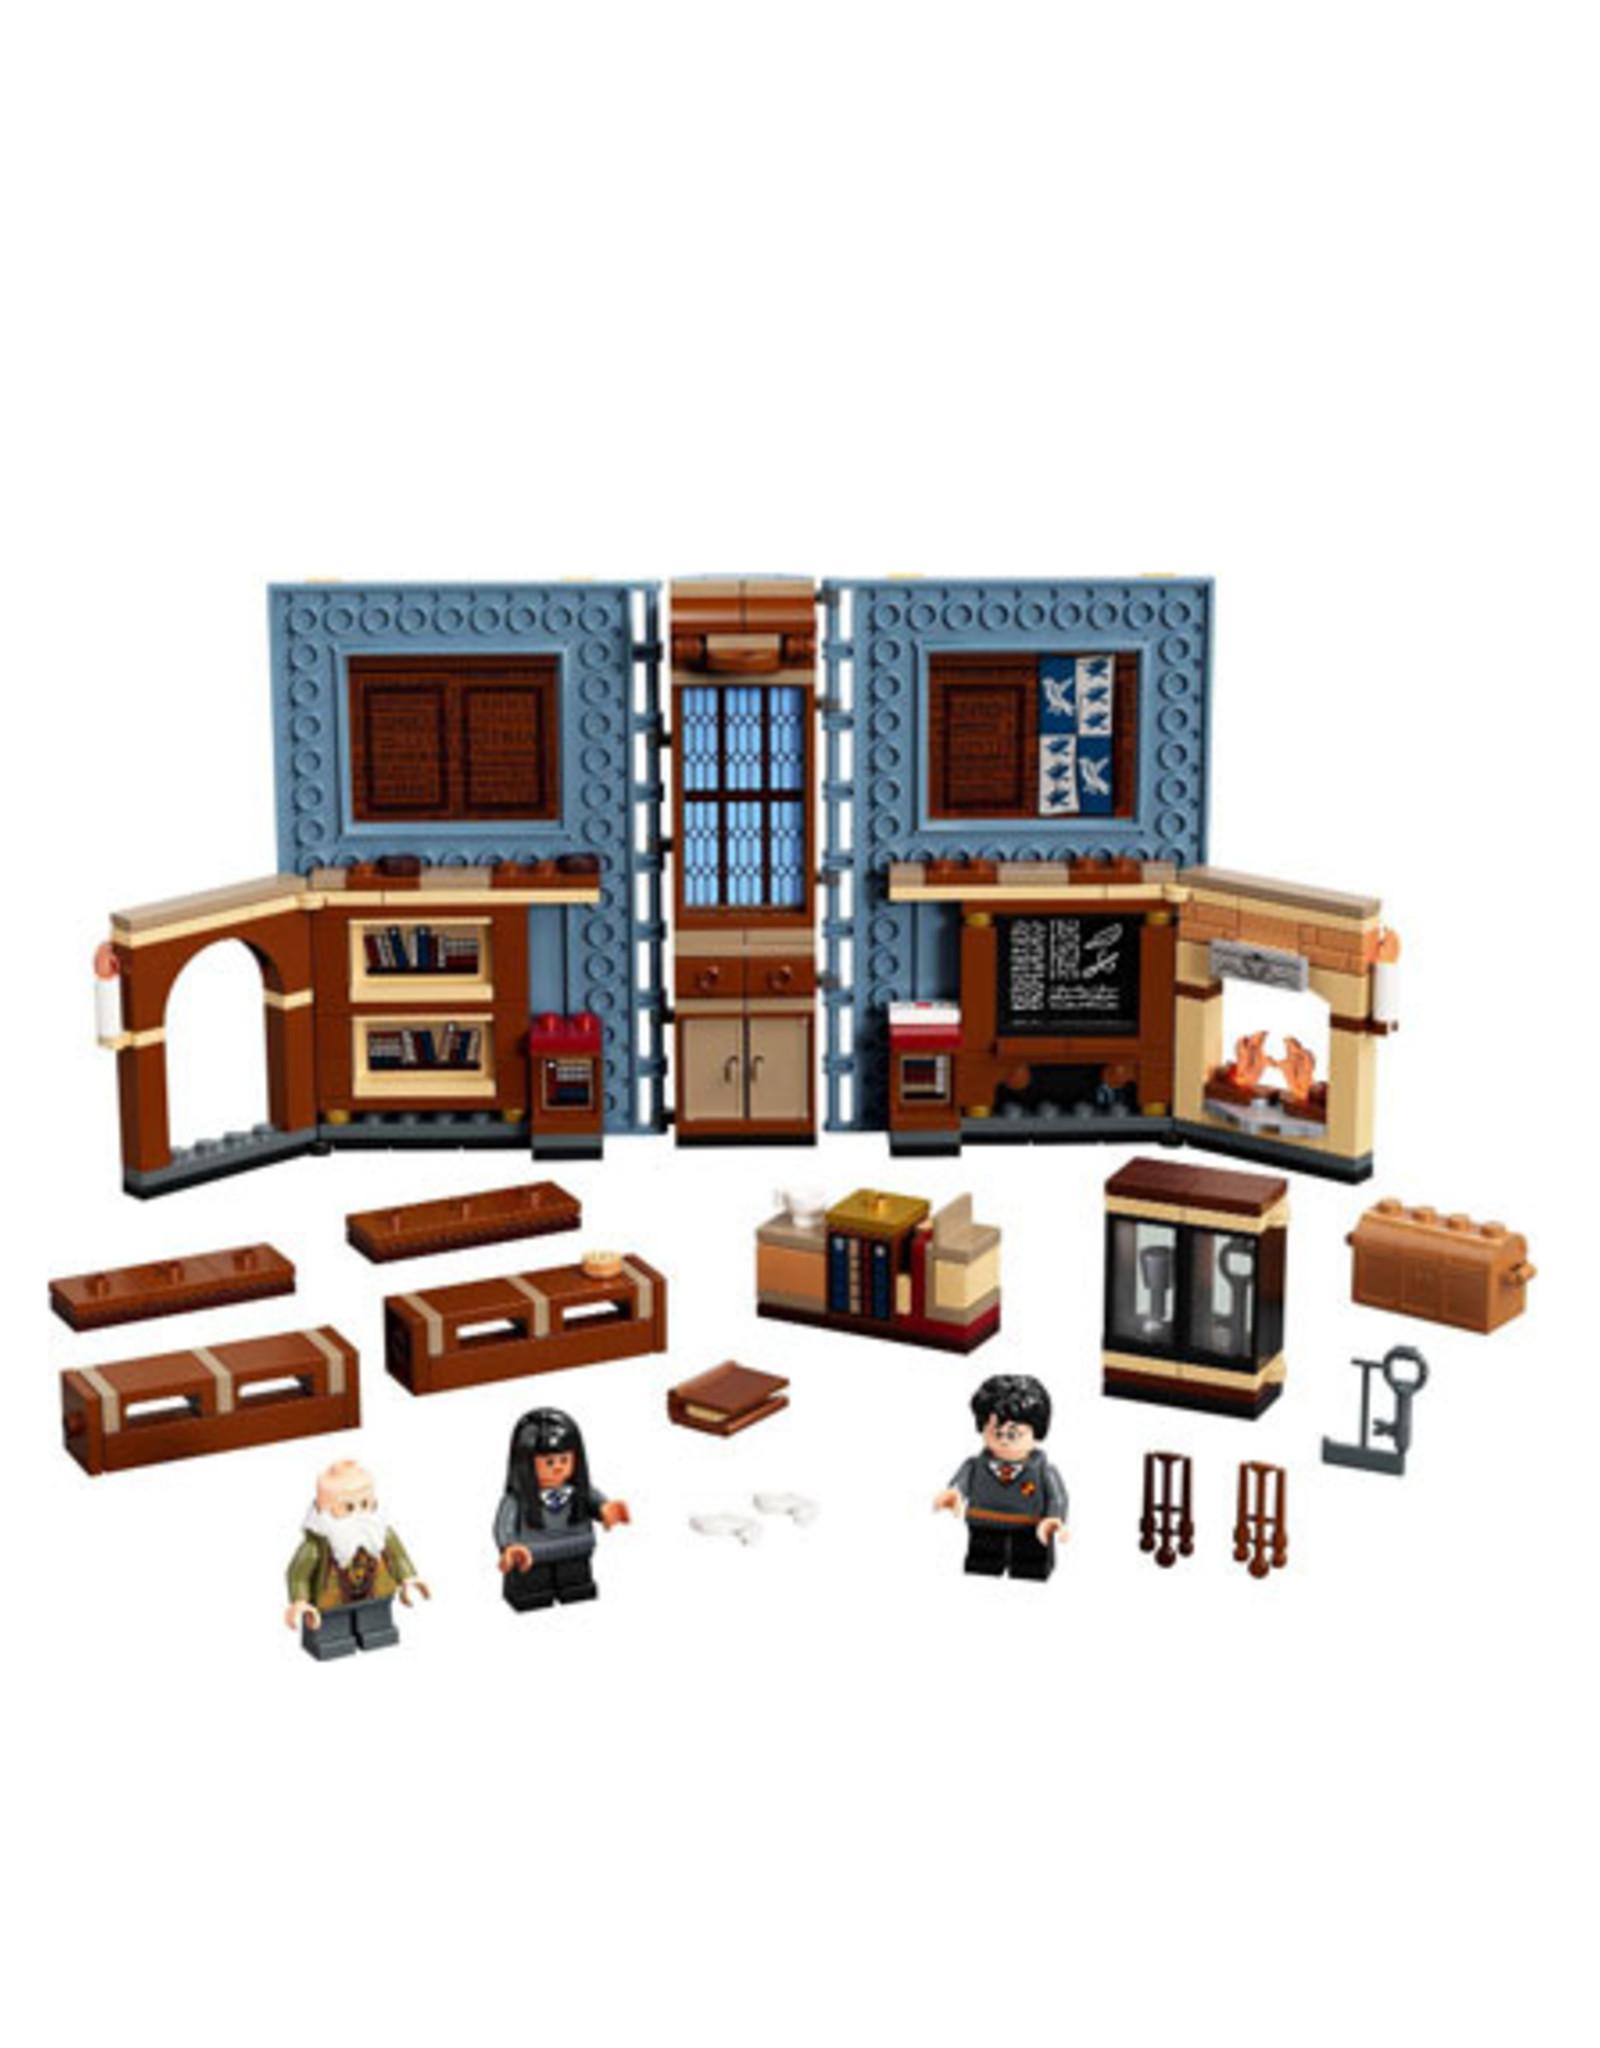 LEGO LEGO 76385 Hogwarts Moment: Charms Class HARRY POTTER